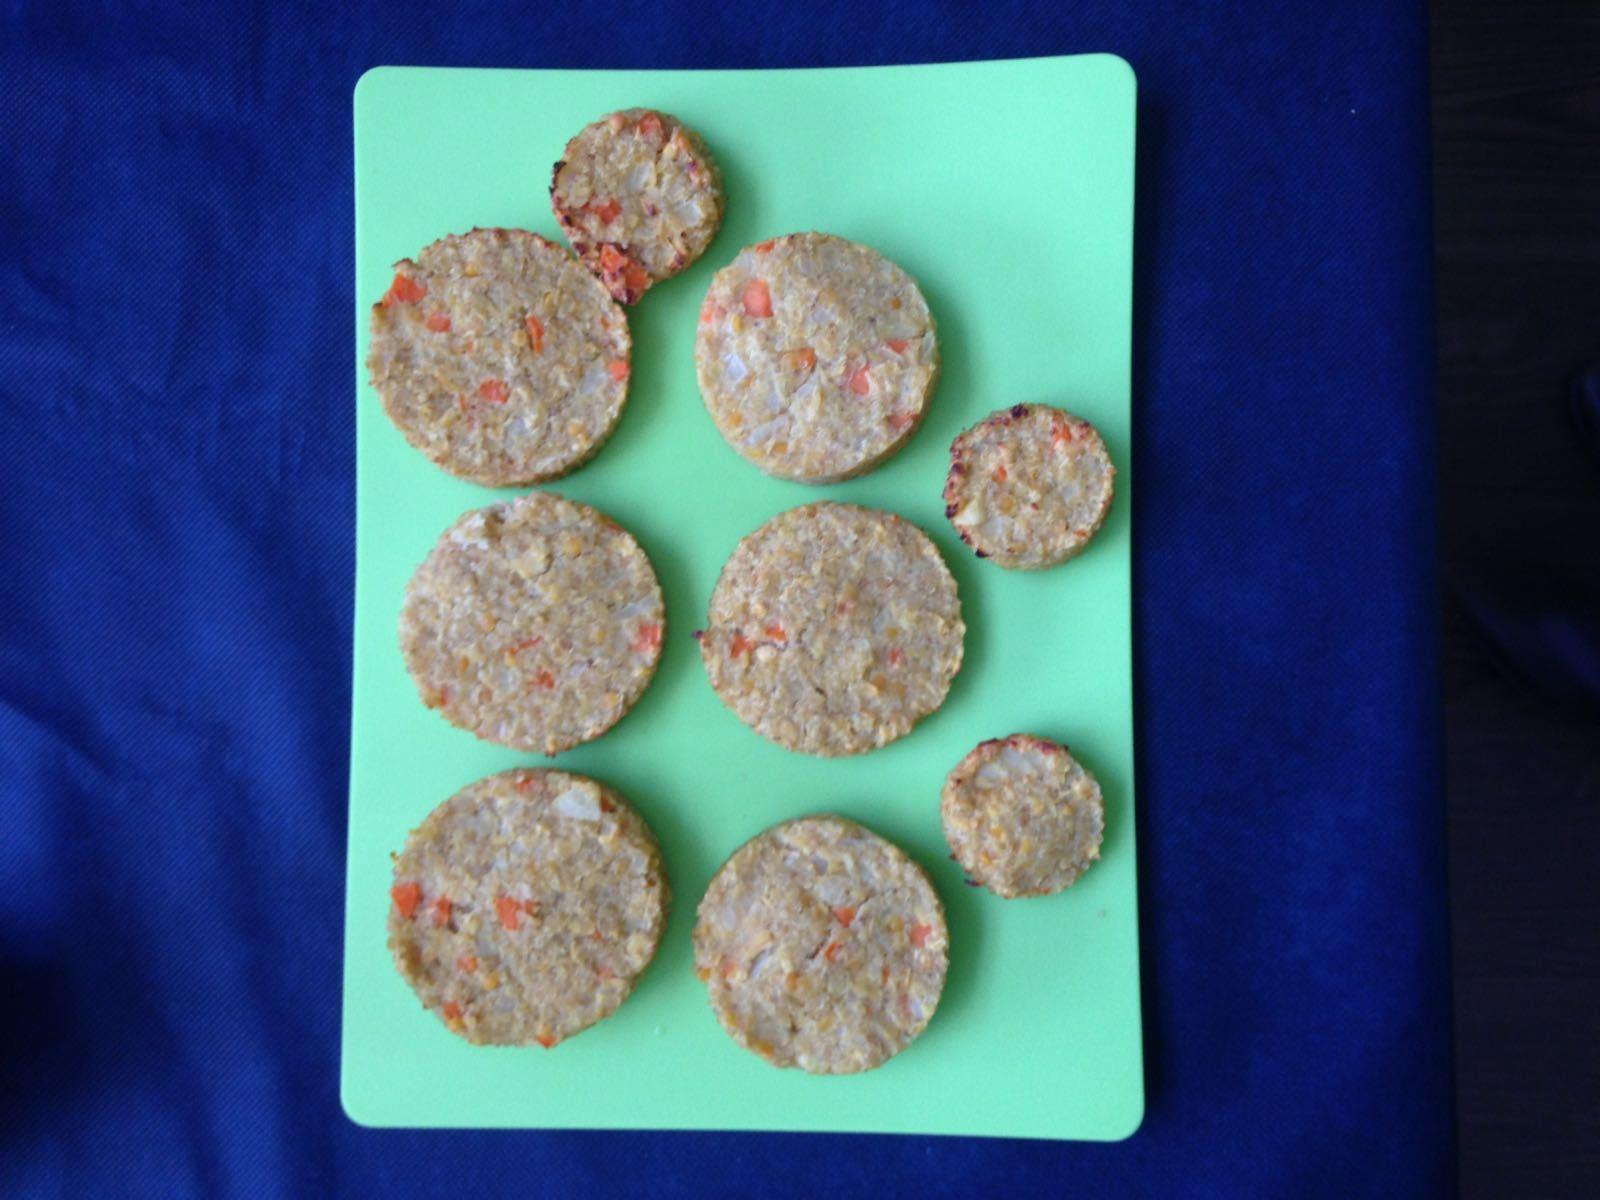 Hamburguesas vegetales con quinoa y lenteja roja